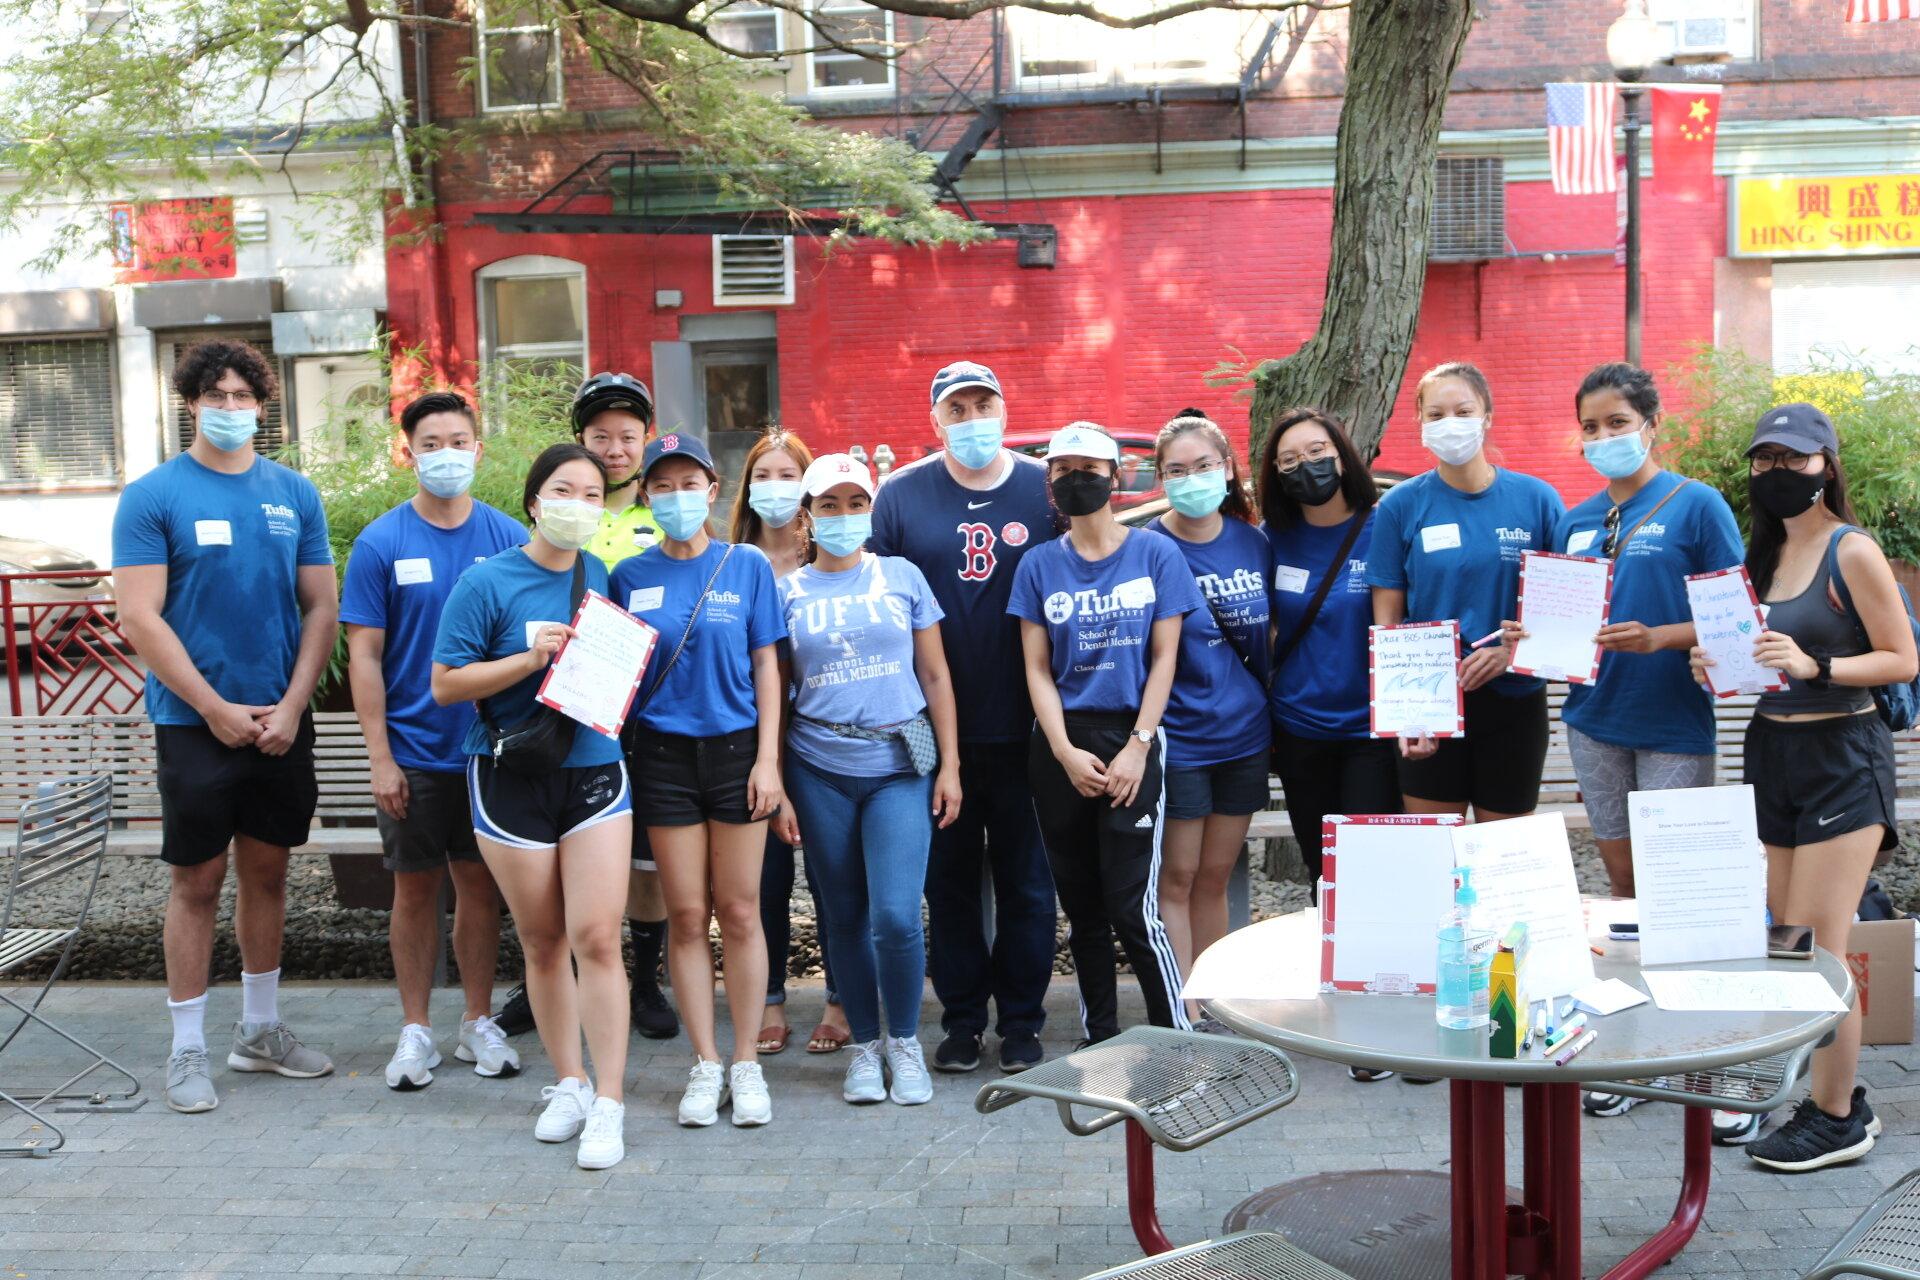 Tufts+Dental+Students+1